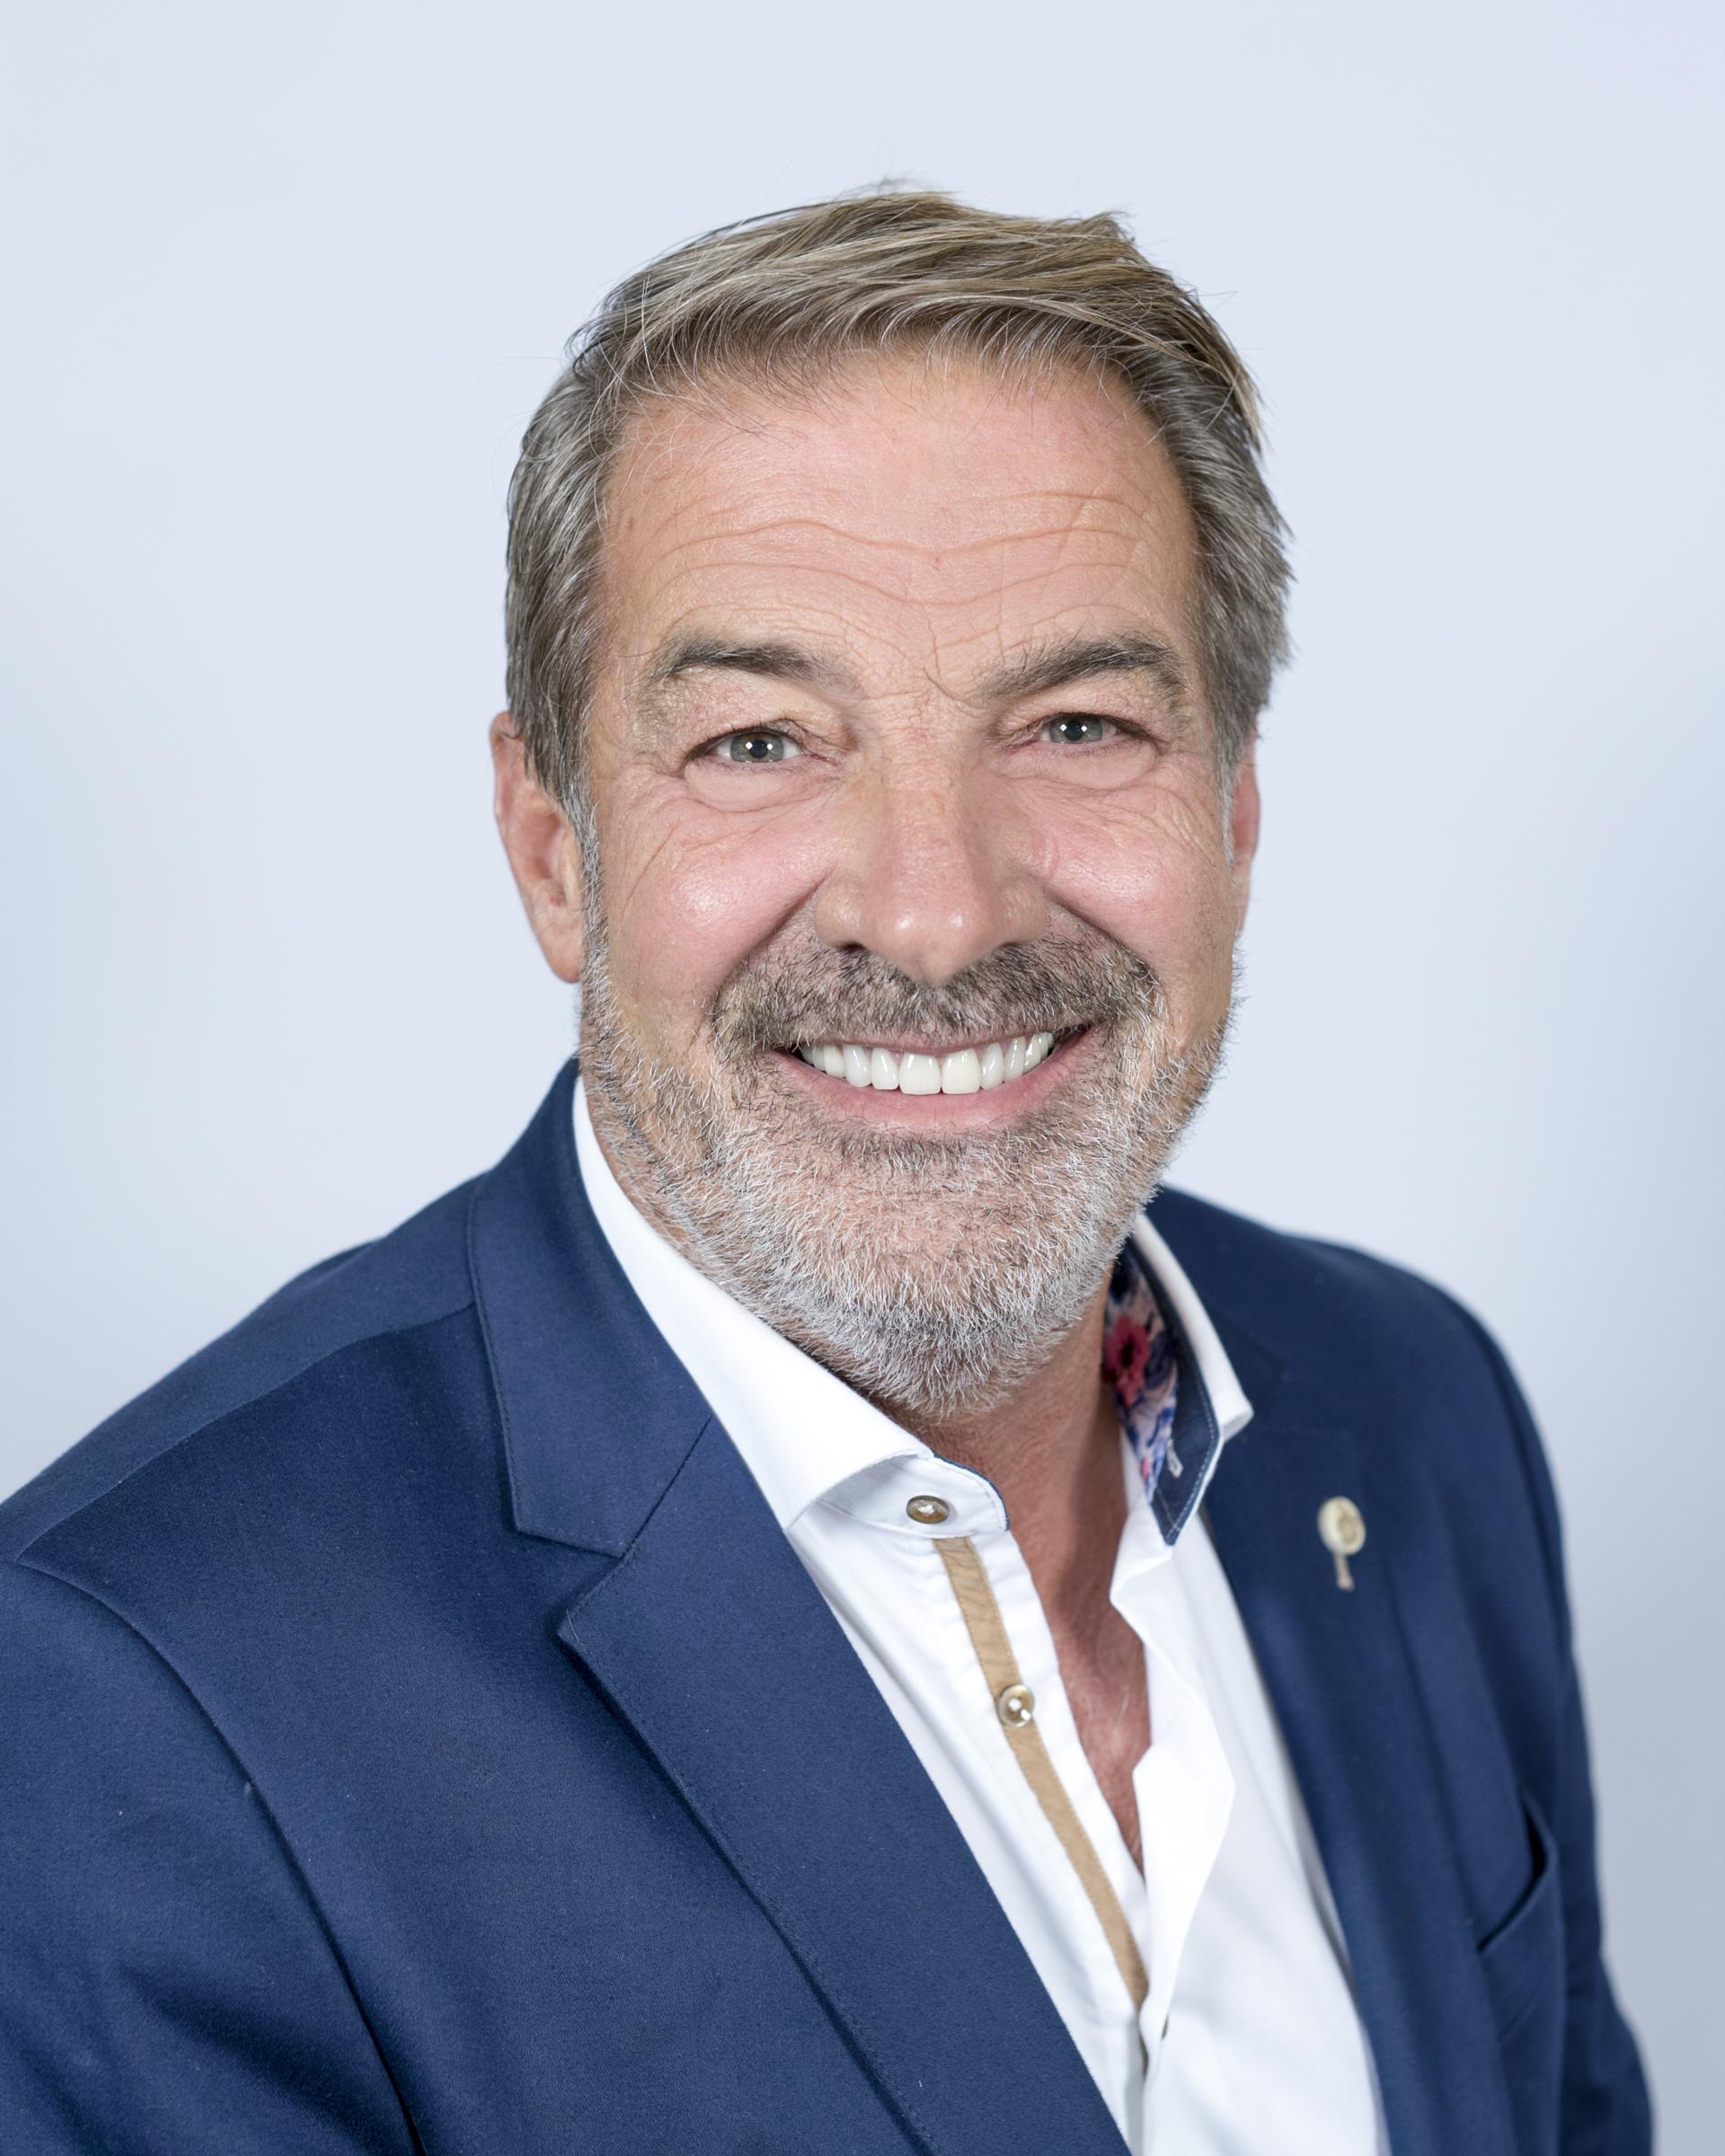 Michael Rogers, Managing Director